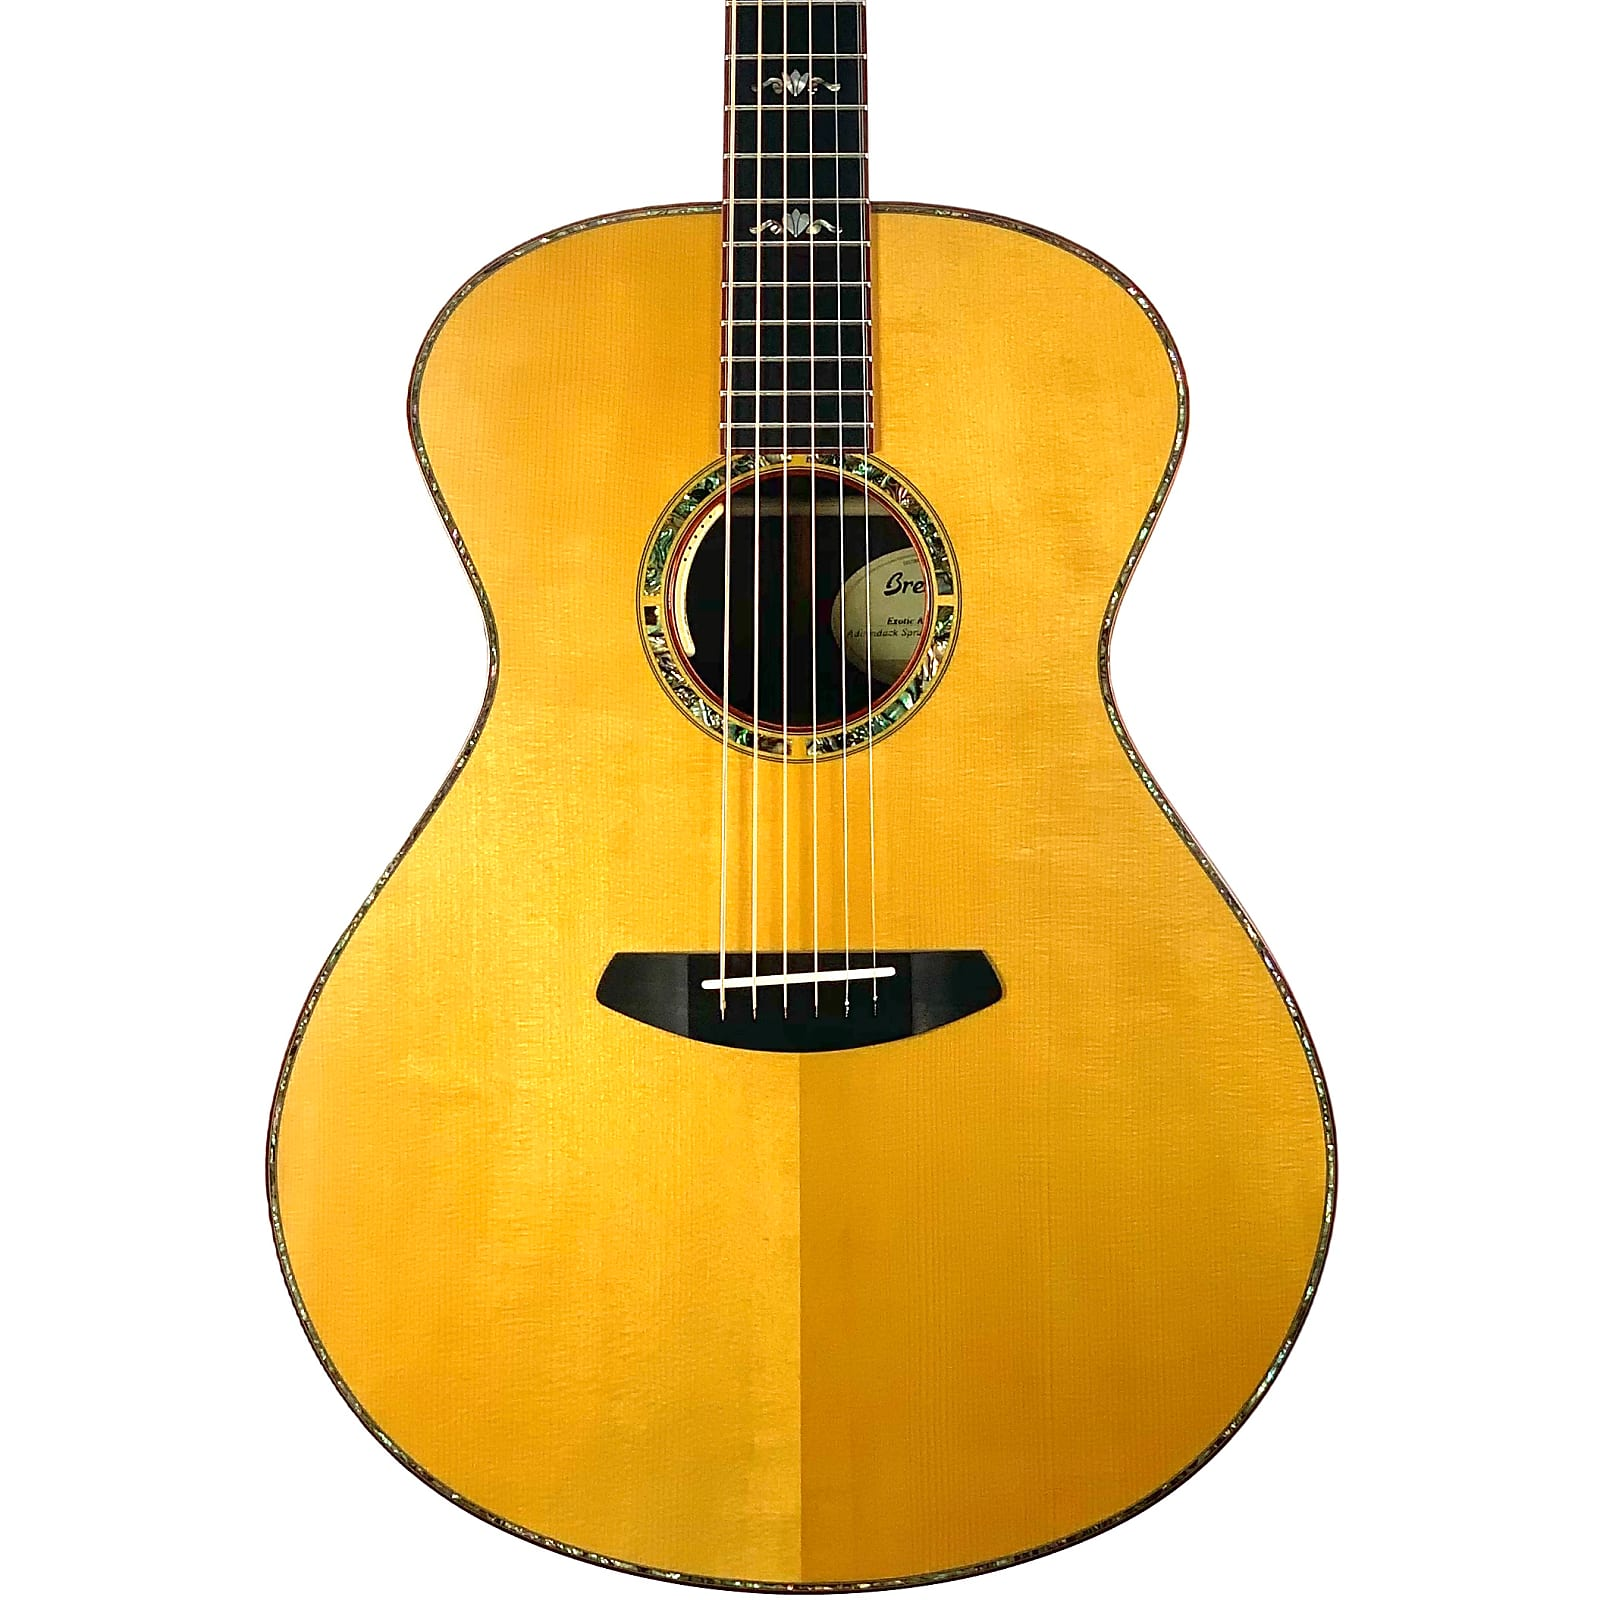 Breedlove Exotic Amazon Concerto E Adirondack Brazilian Rosewood Acoustic Guitar - Brand New!